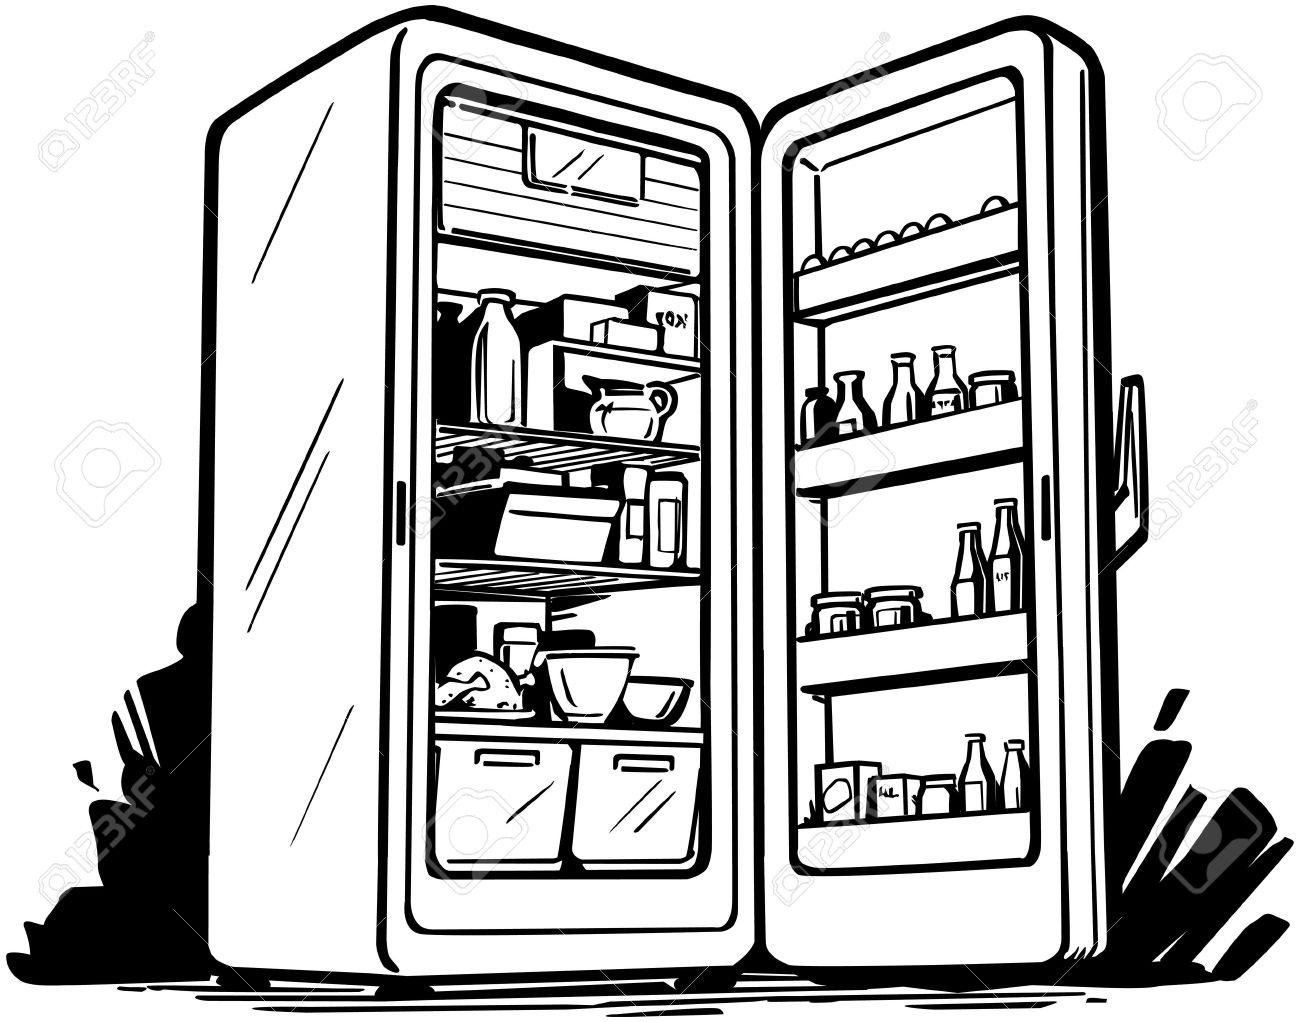 892 Refrigerator free clipart.